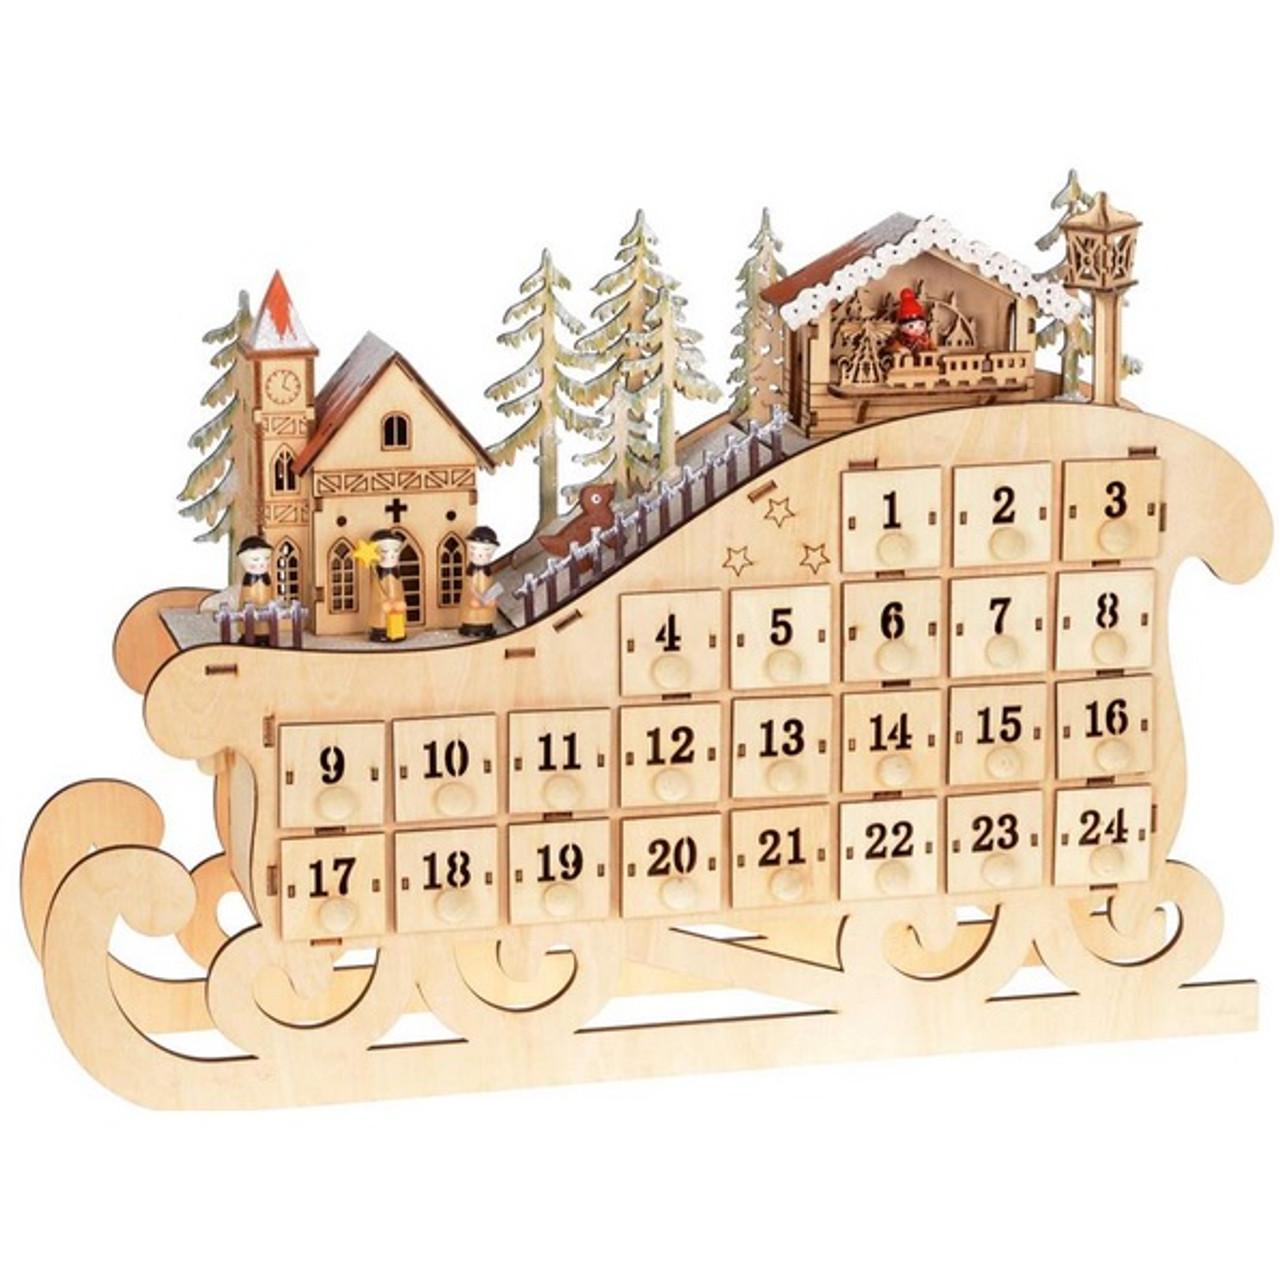 Wooden Advent Calendar With Lights And Music Retrofestive Ca